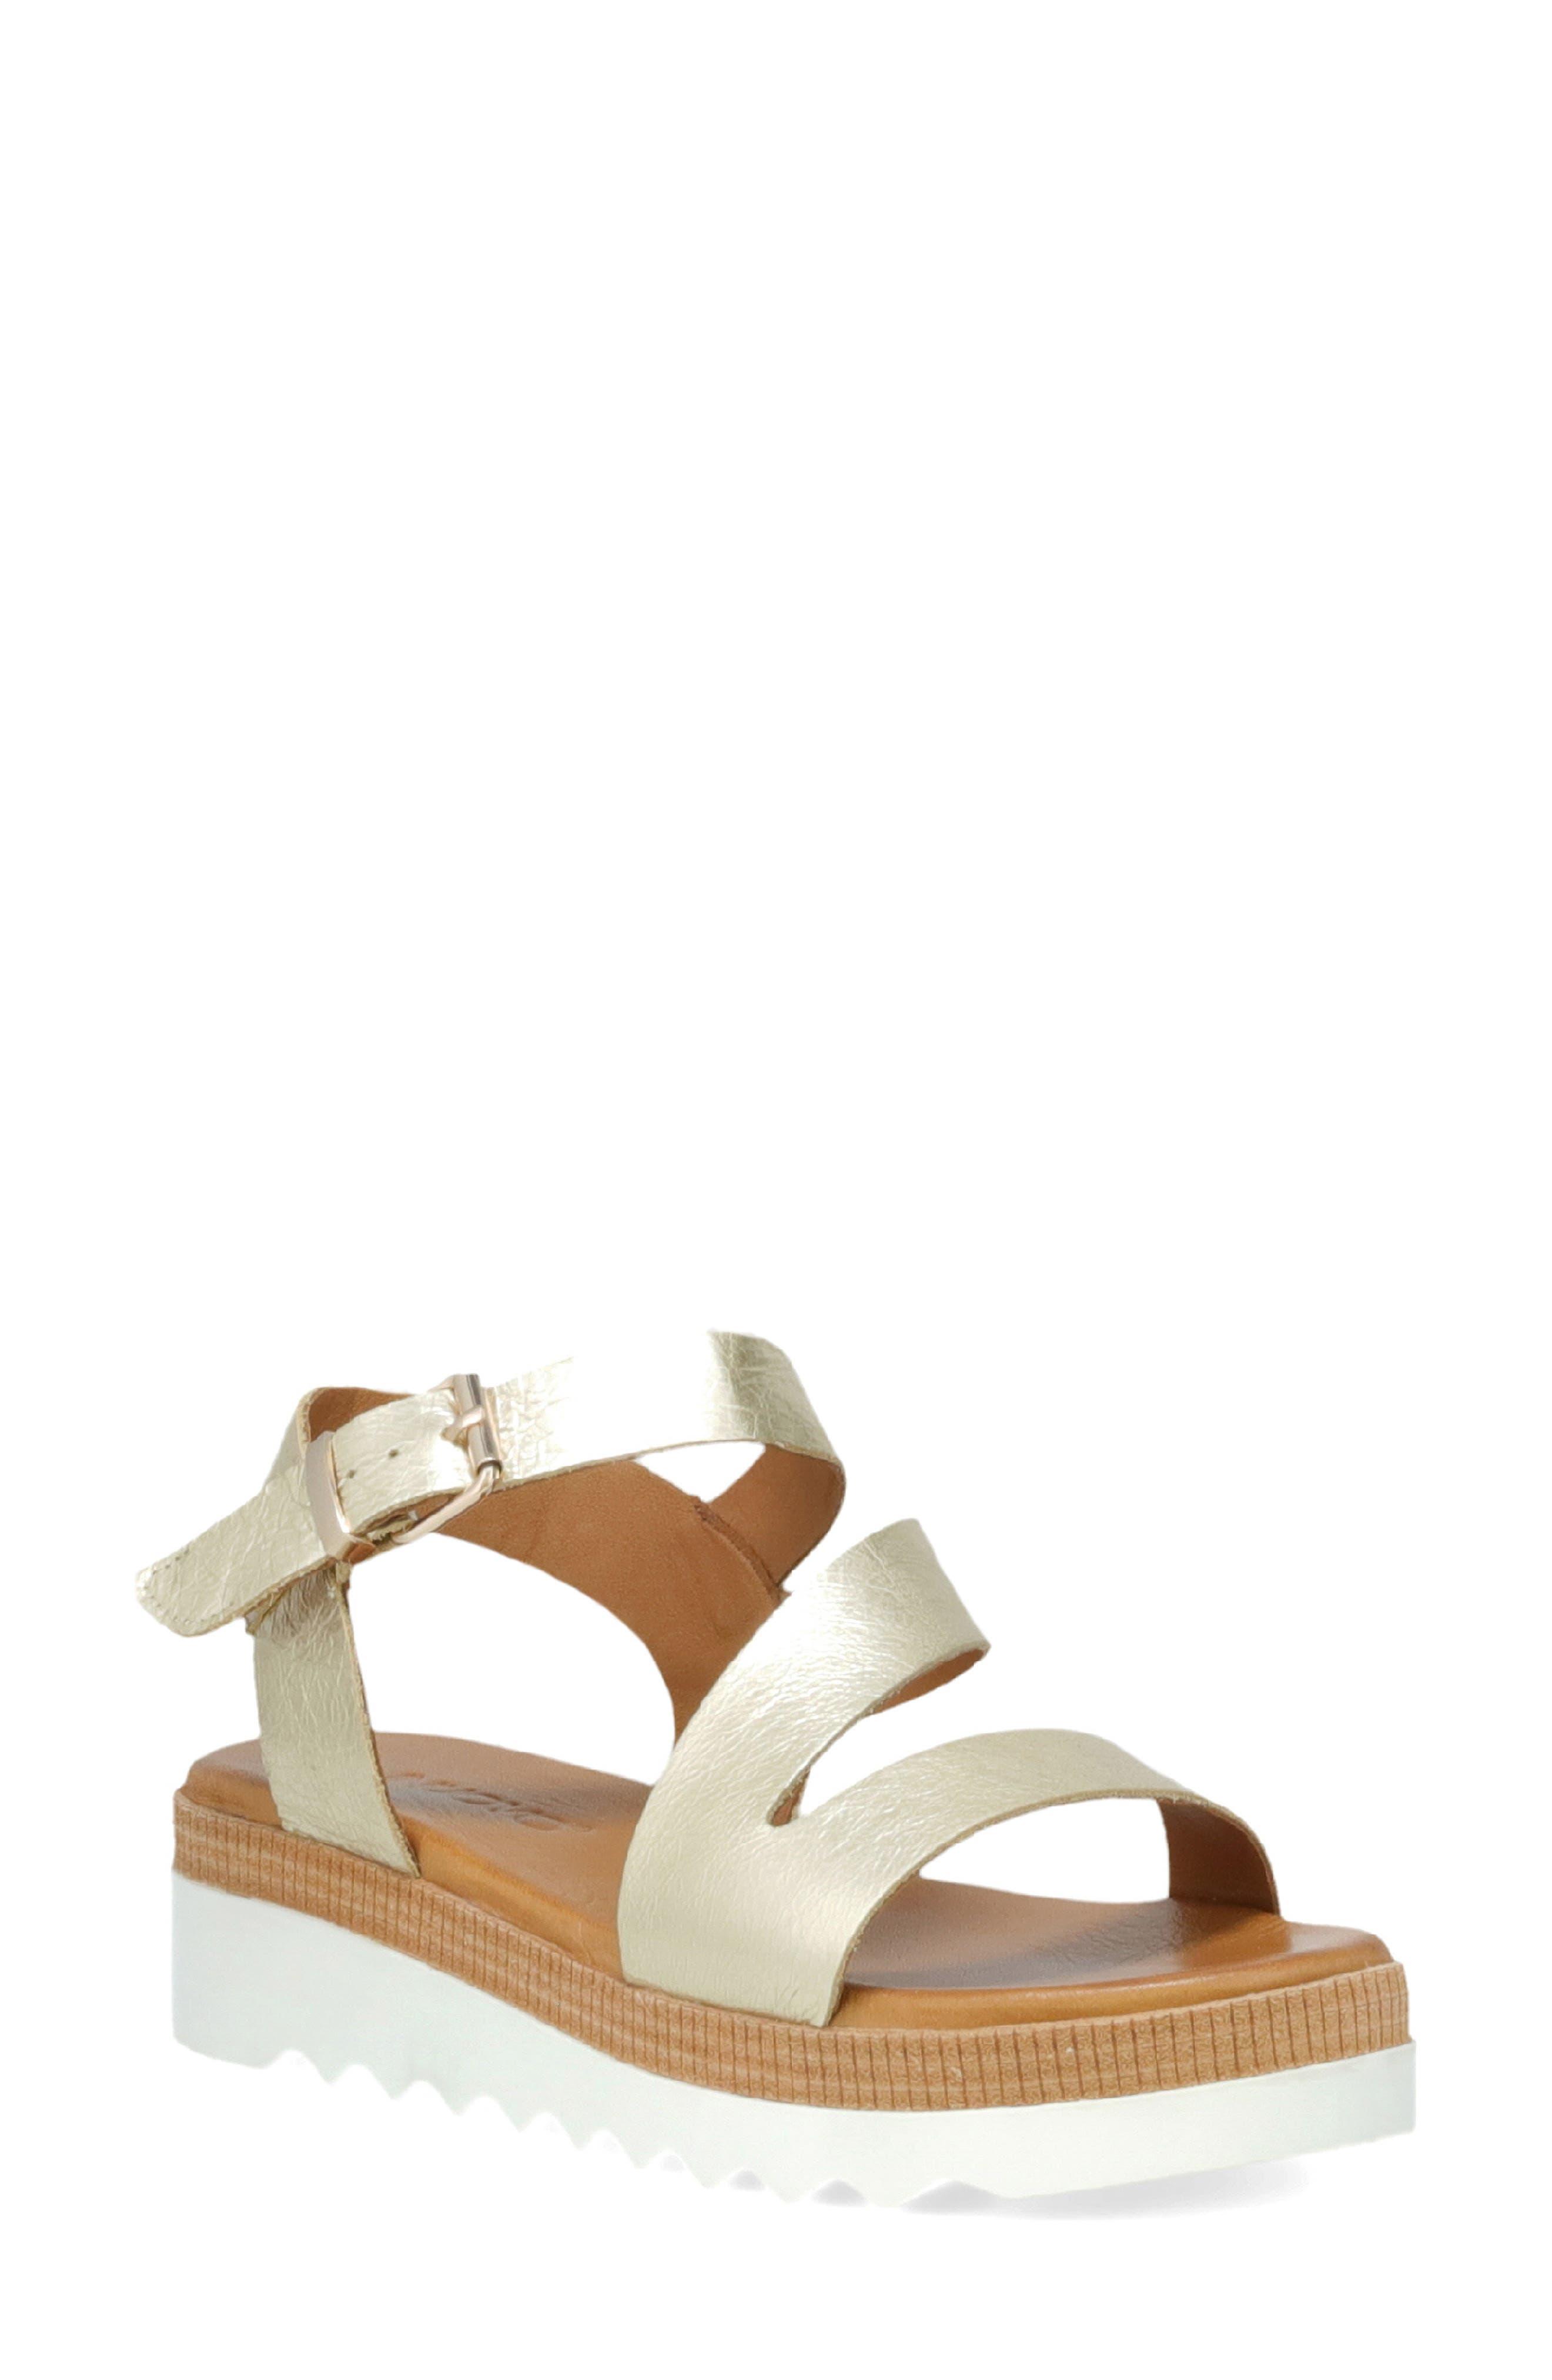 Farrish Wedge Sandal